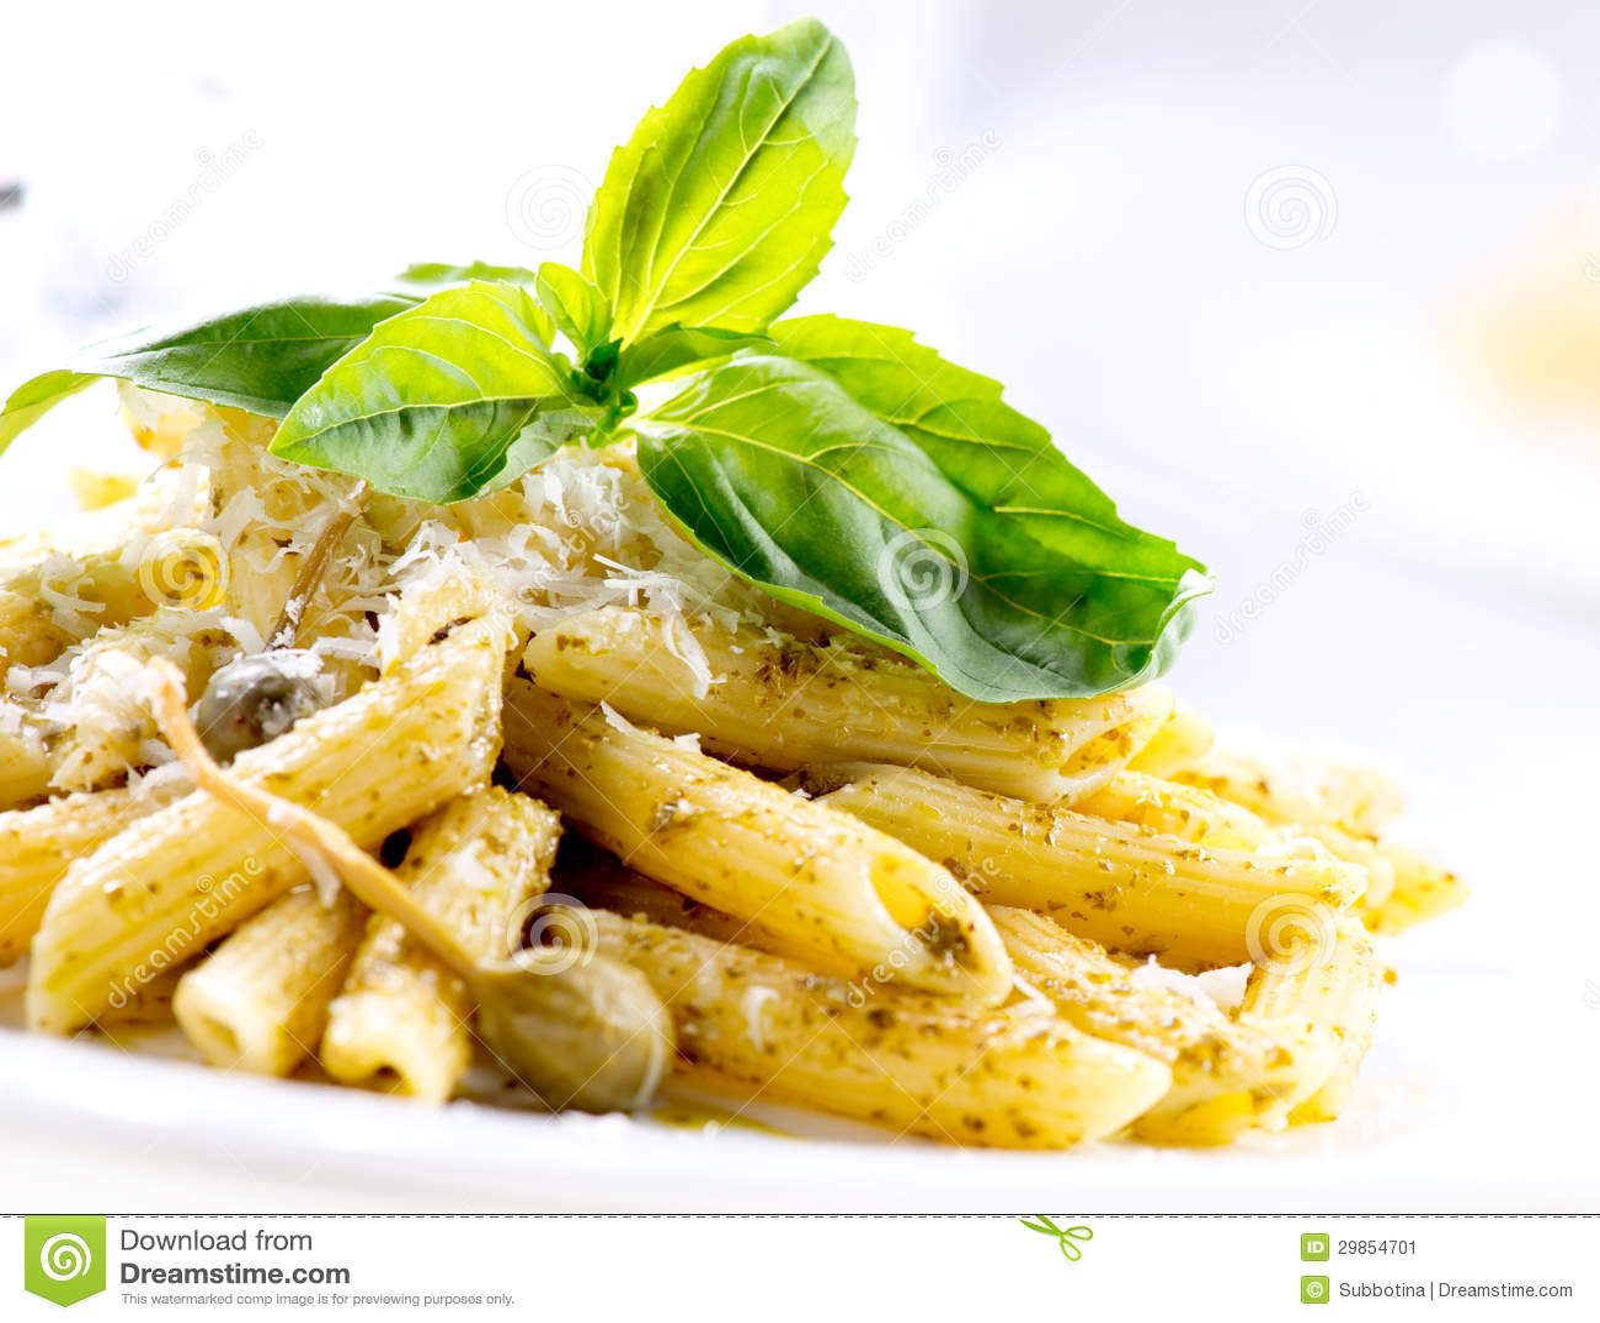 Penne pasta with pesto sauce stock image image 29854701 - Italian cuisine pasta ...